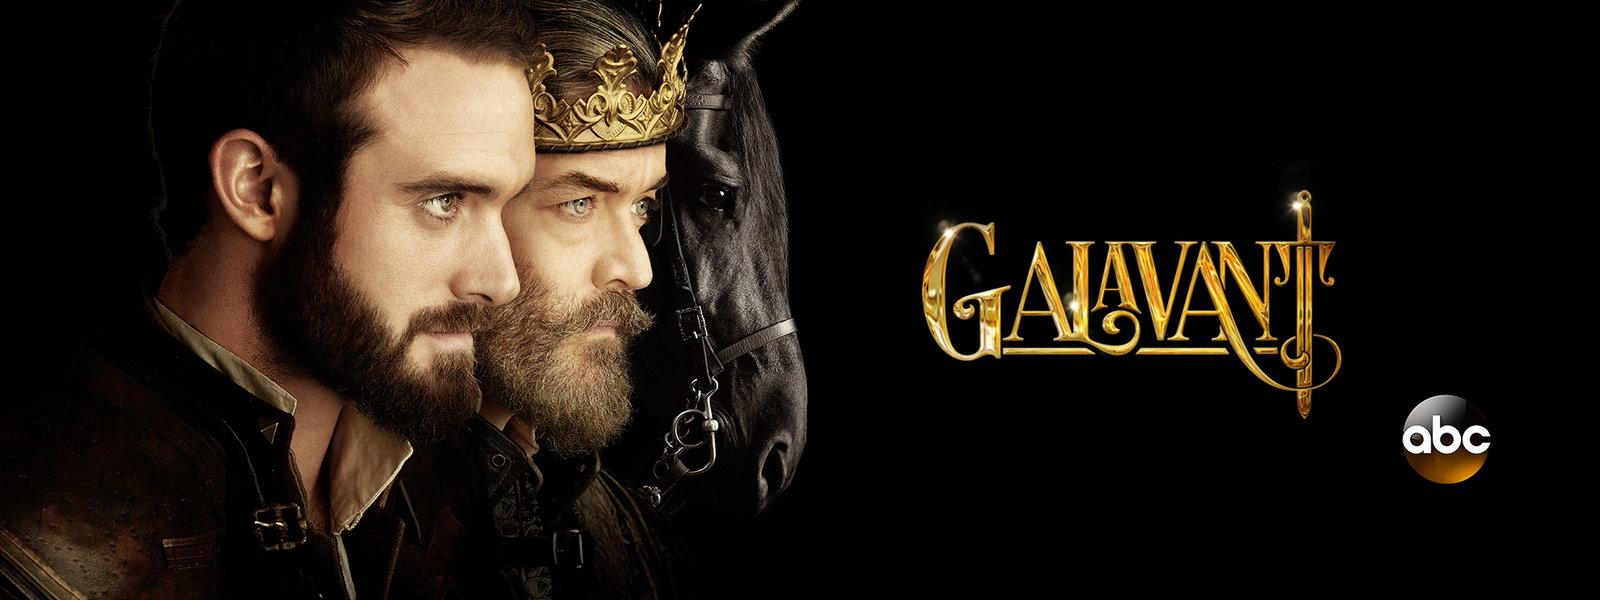 Galavant premieres on Jan. 3 at 8 p.m. ET on ABC Television Network. | PC: therosettenews.com